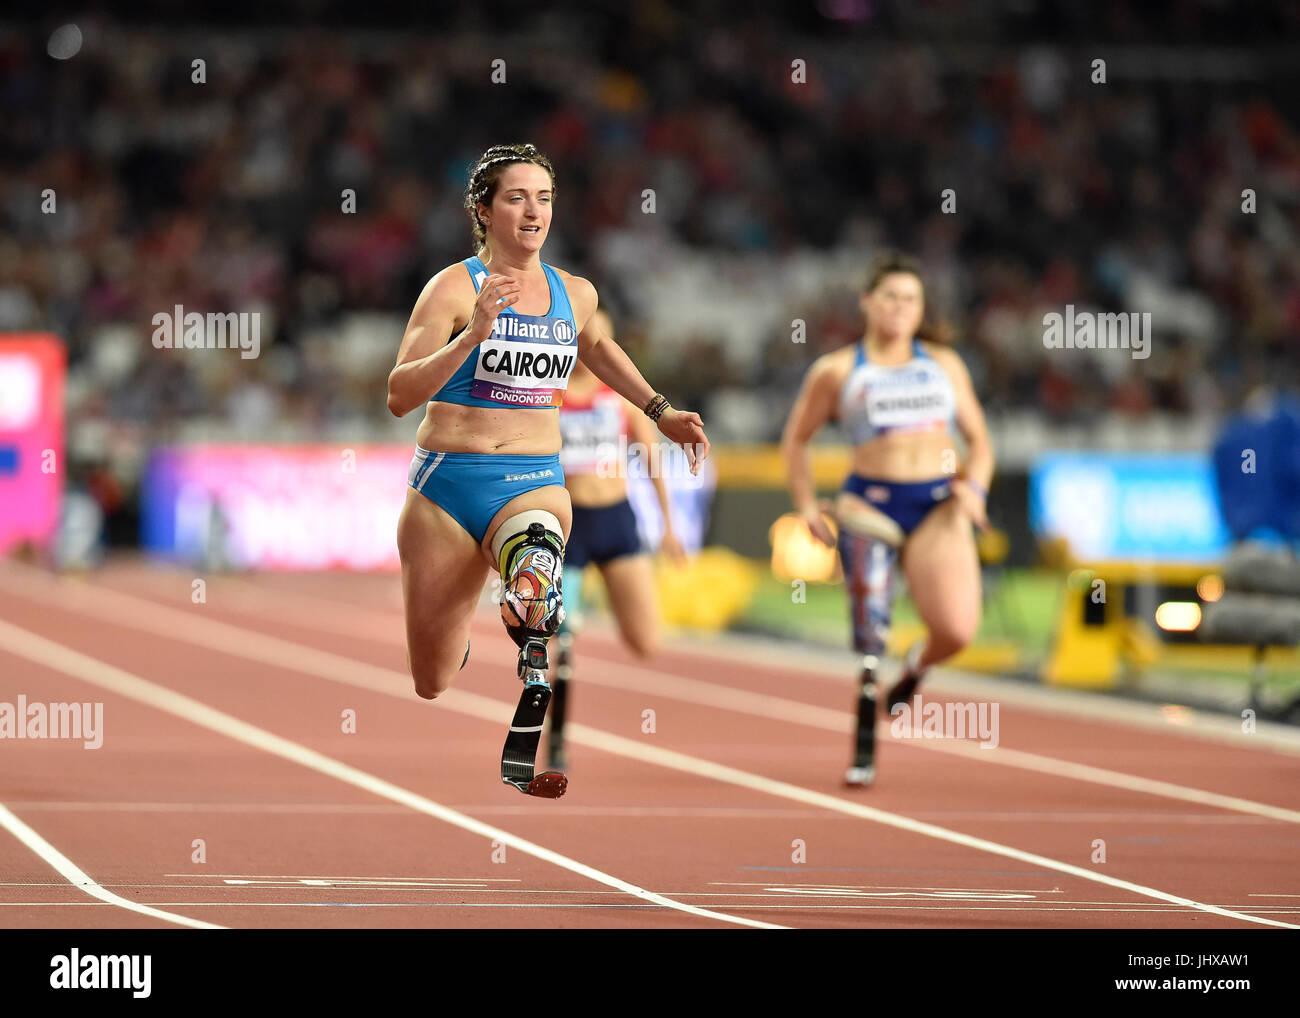 London, UK. 16th July, 2017.  Martina Caironi wins the Women's 1000M T42 Final during World Para Athletics Championships - Stock Image